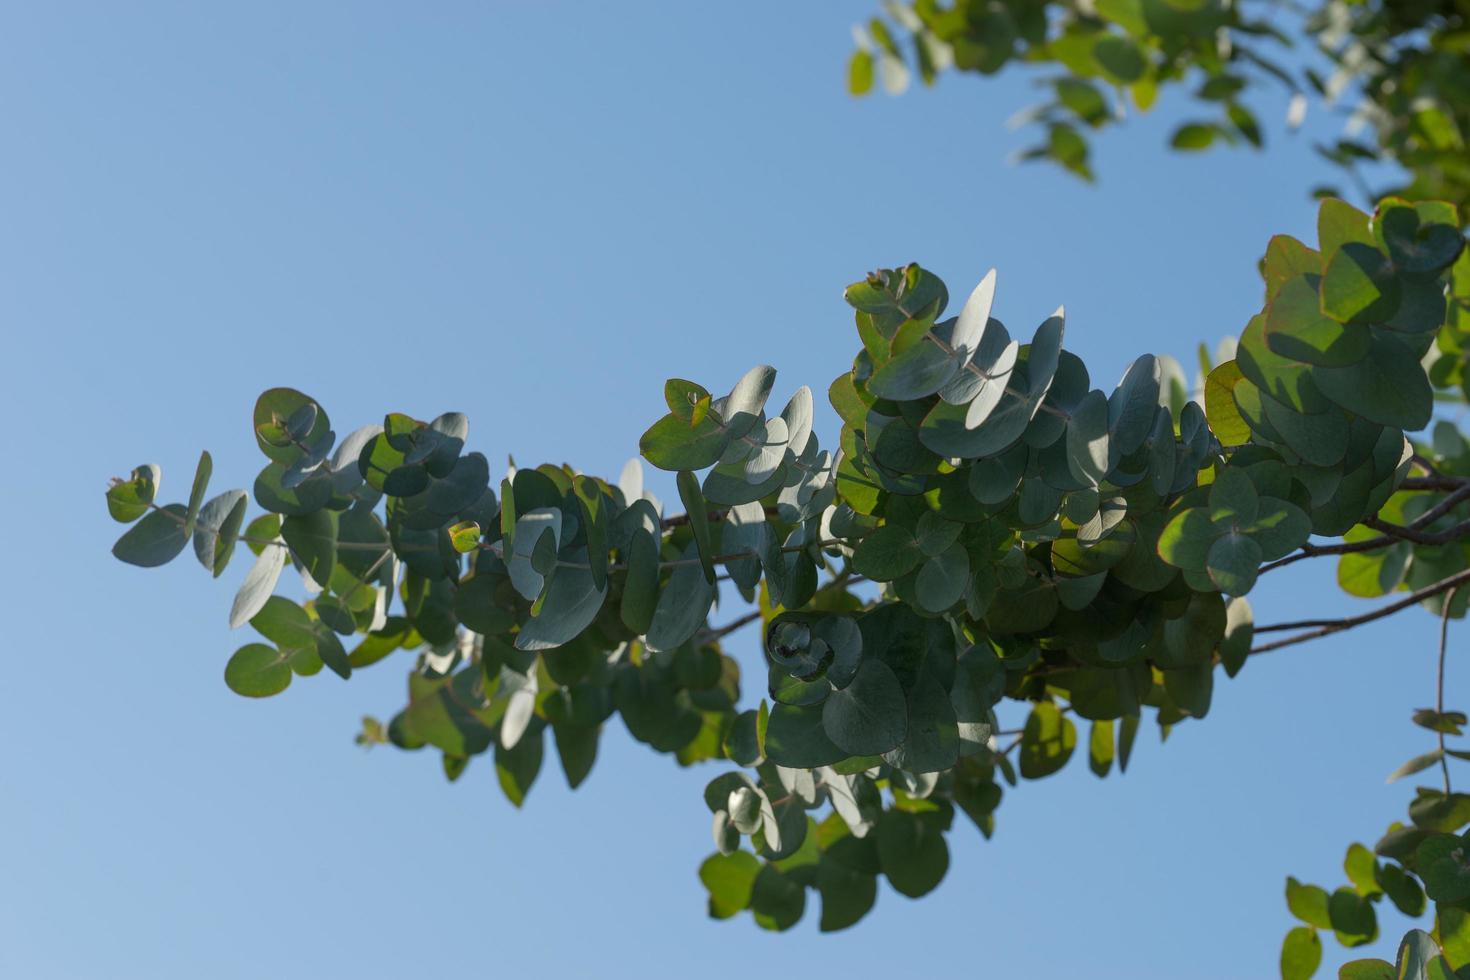 un ramo di eucalipto con foglie argentee foto